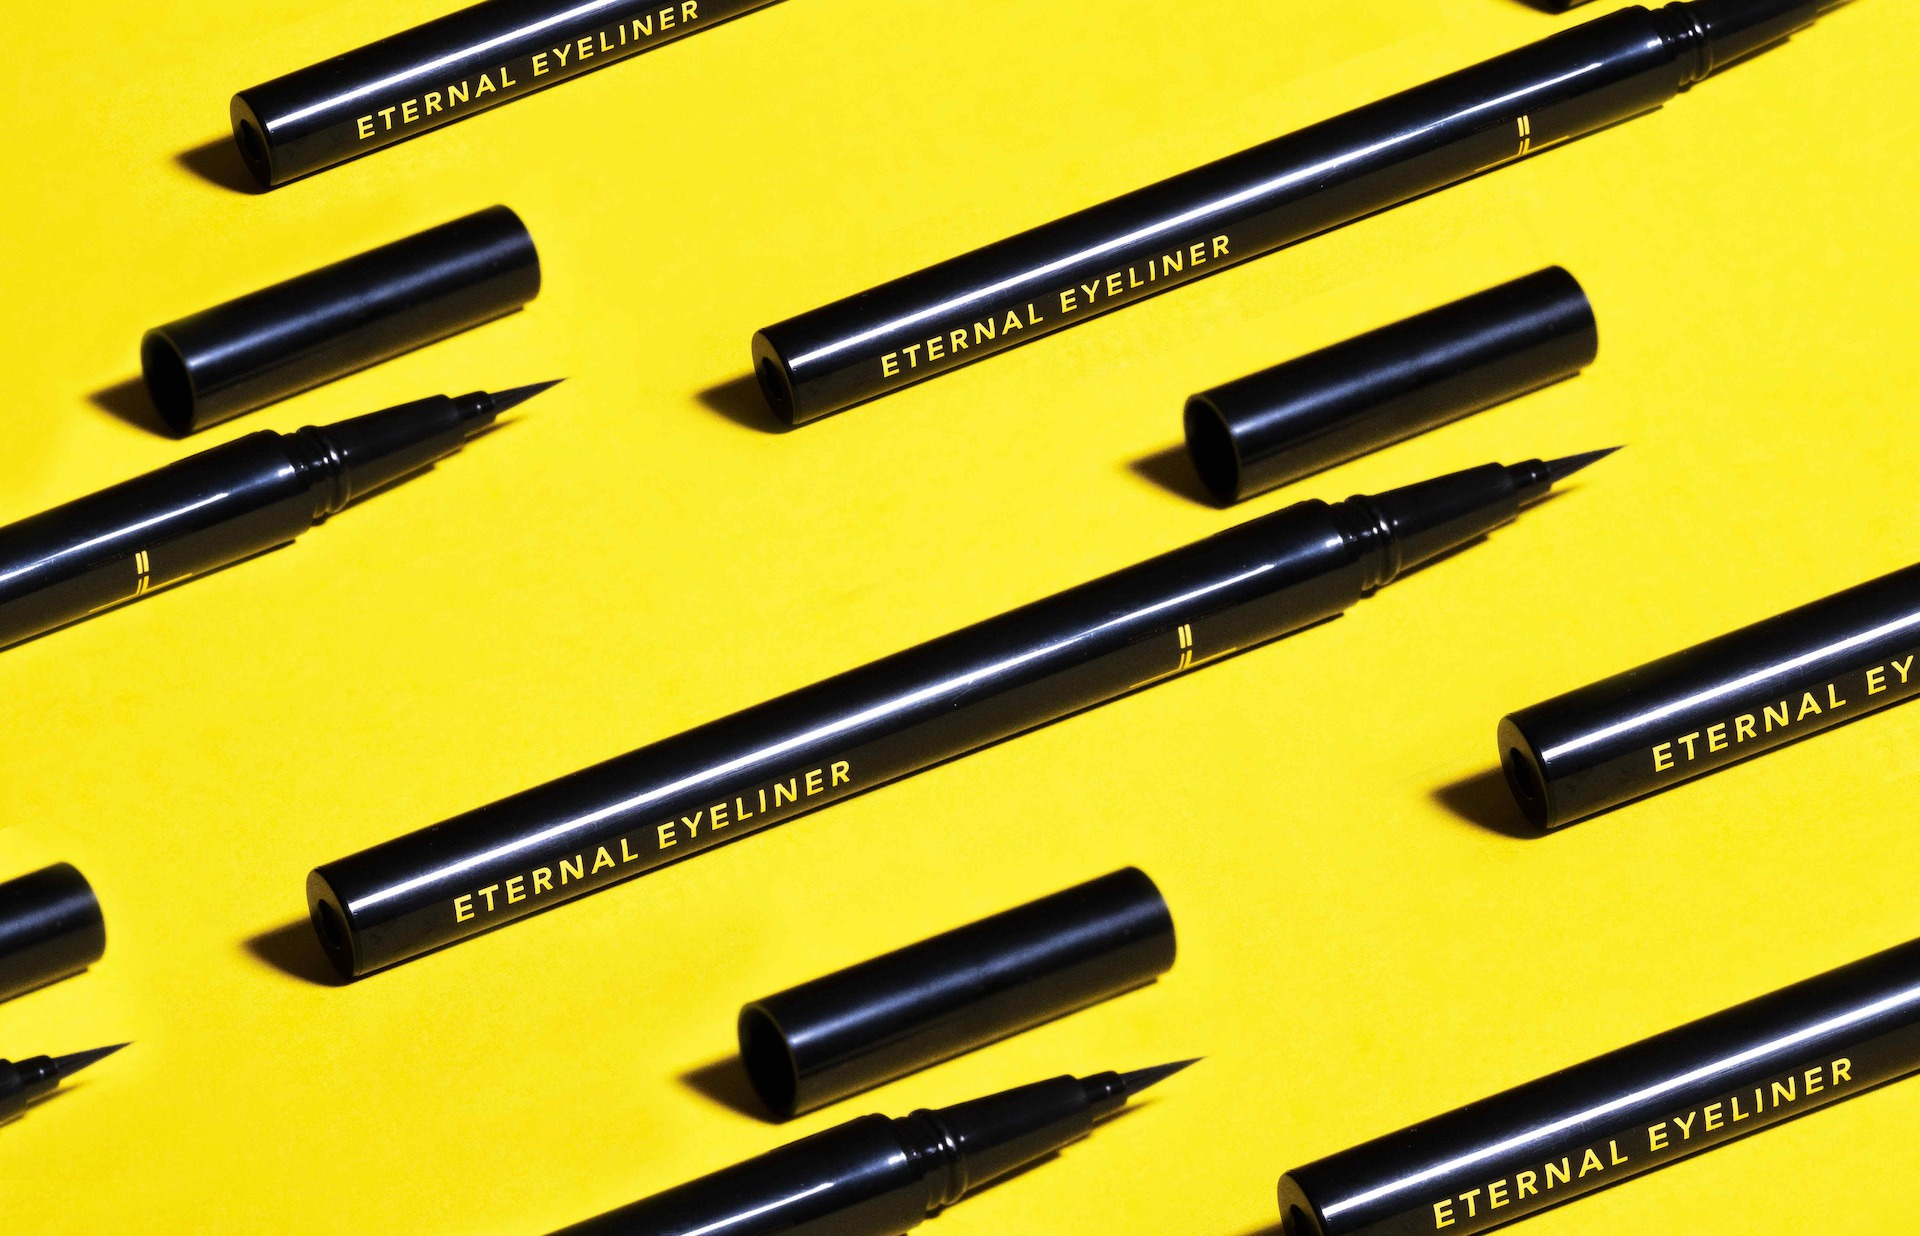 Eternal Eyeliner Black